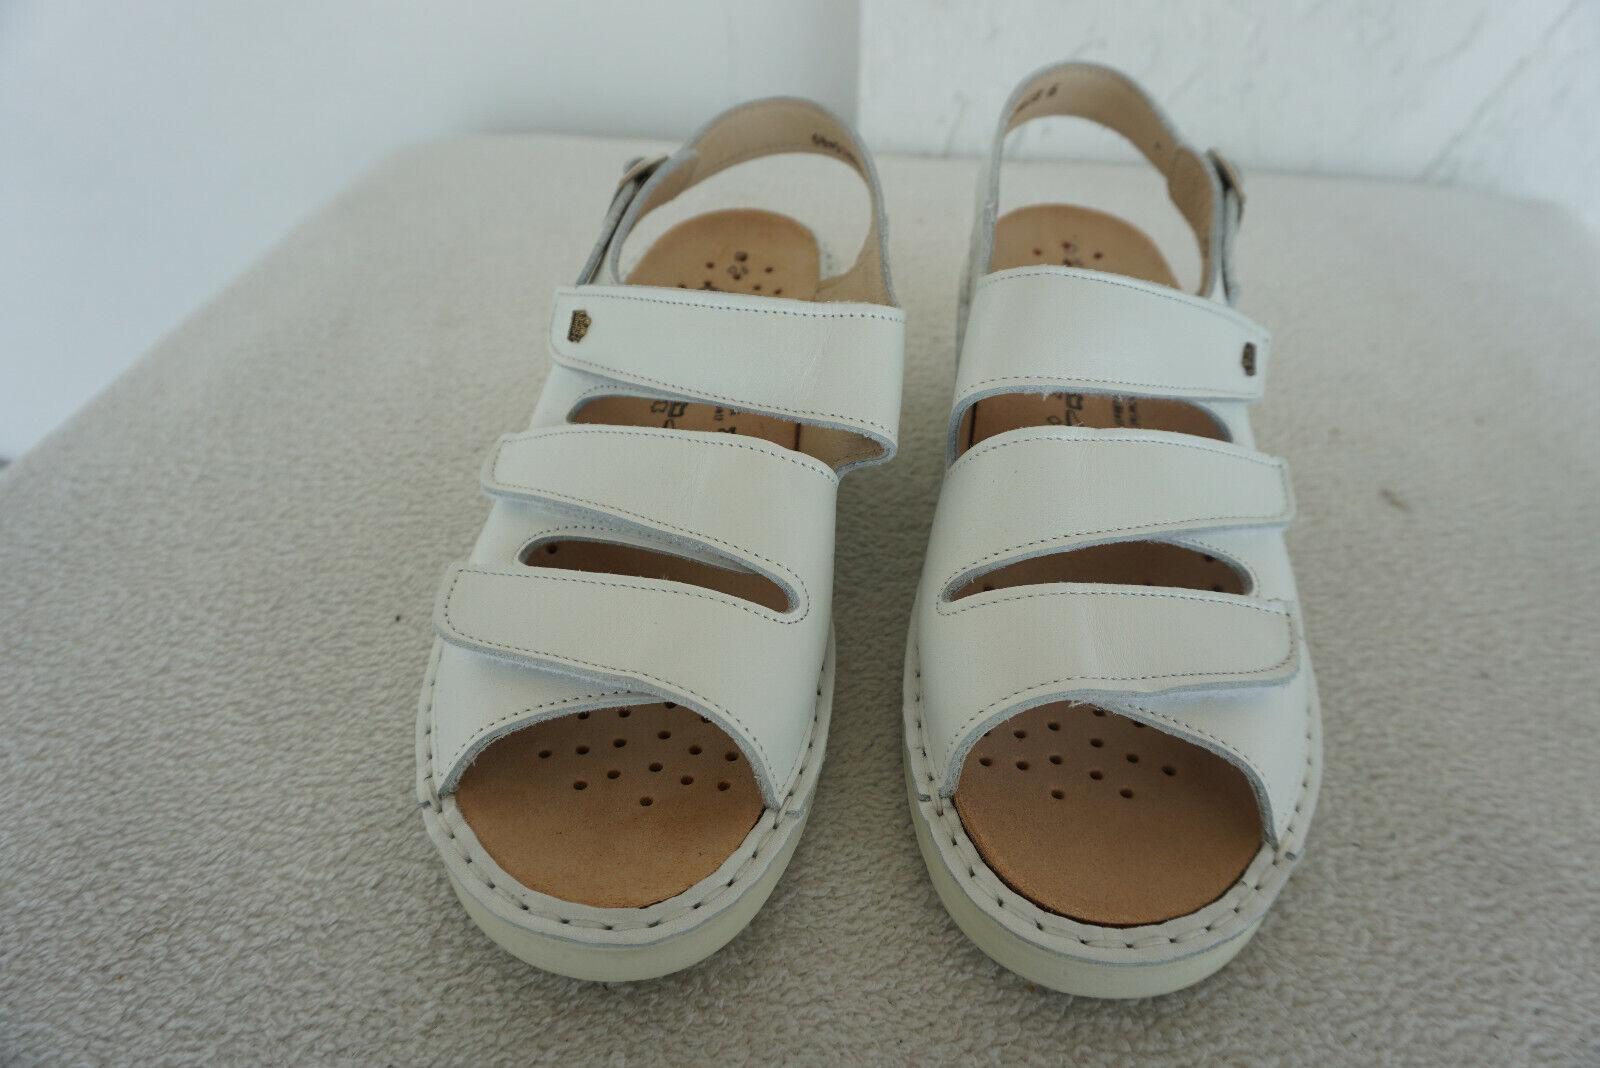 FINN COMFORT Samos Sommer Schuhe Klett Sandalen Gr.39,5 Weiß Einlagen leder NEU